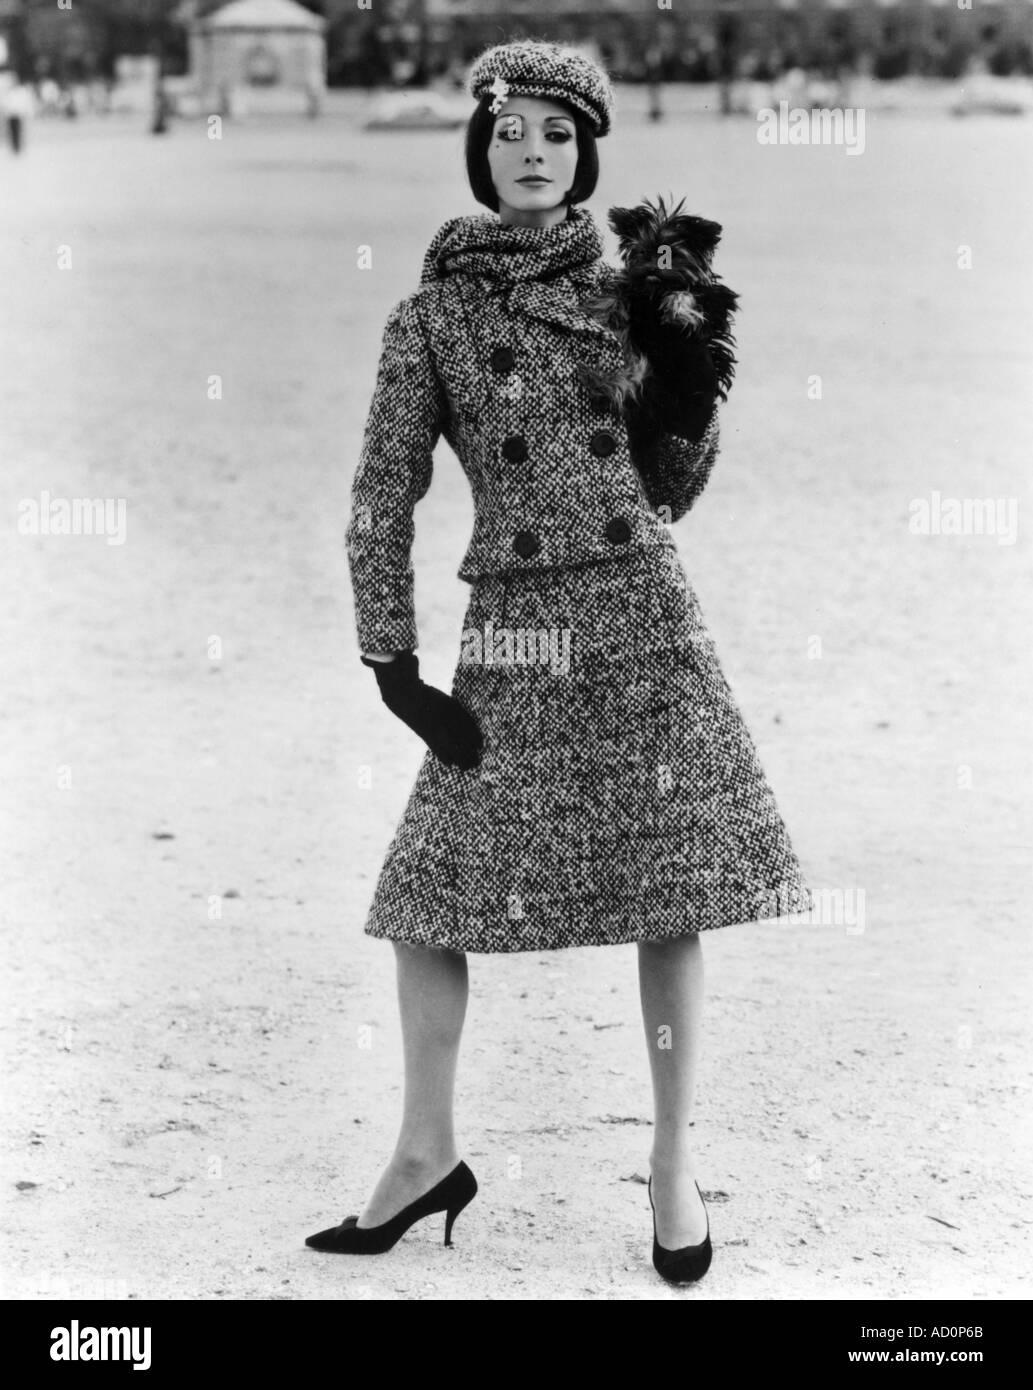 Tweed suit da Christian Dior, Parigi. Foto di Giovanni francese, Londra, Inghilterra, 1961. Immagini Stock